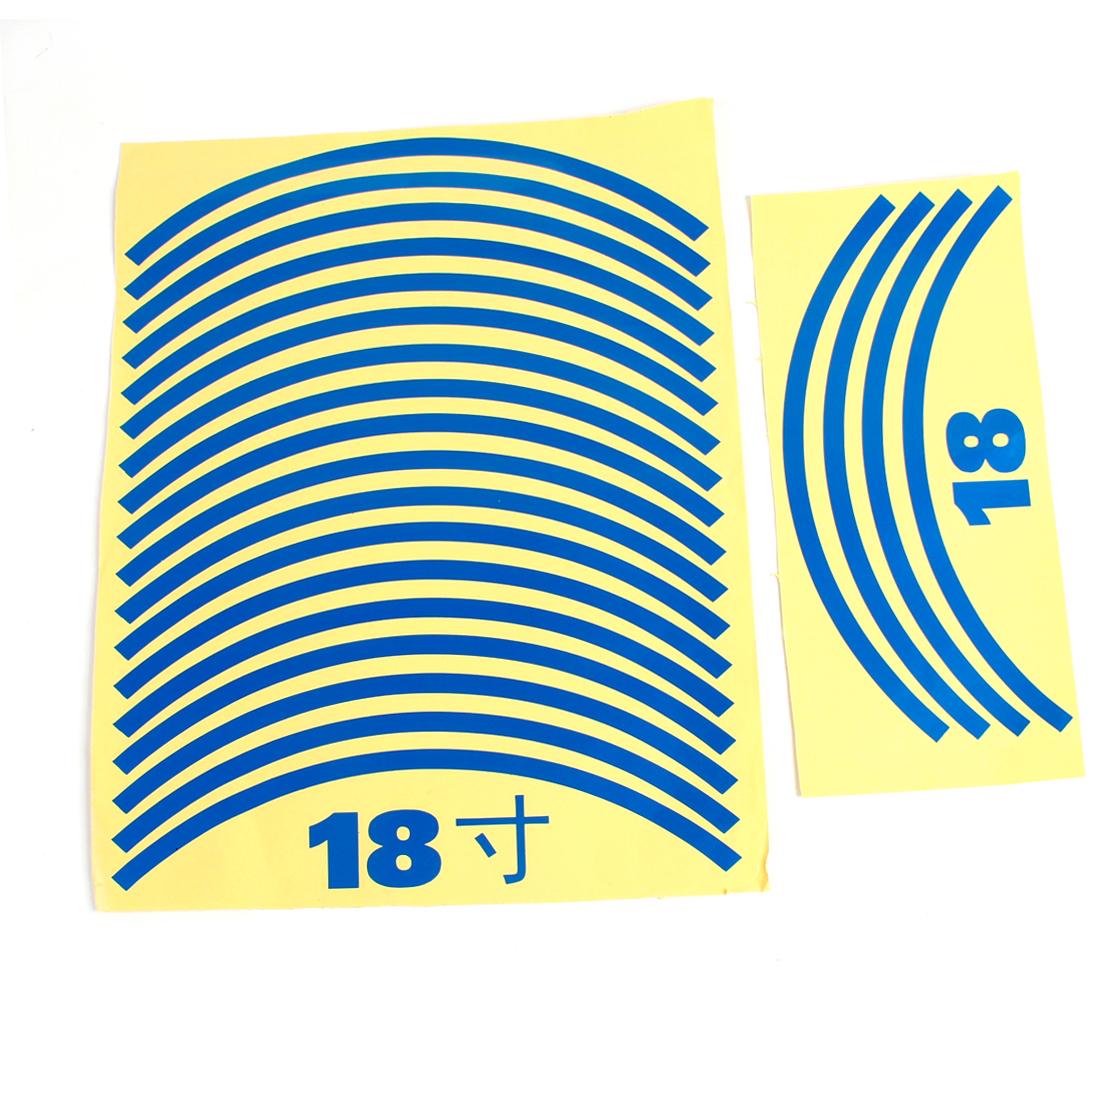 "22pcs 29cm Length Blue Auto Decal Tire Rim Wheel Decoration Sticker for 18"" Wheels"